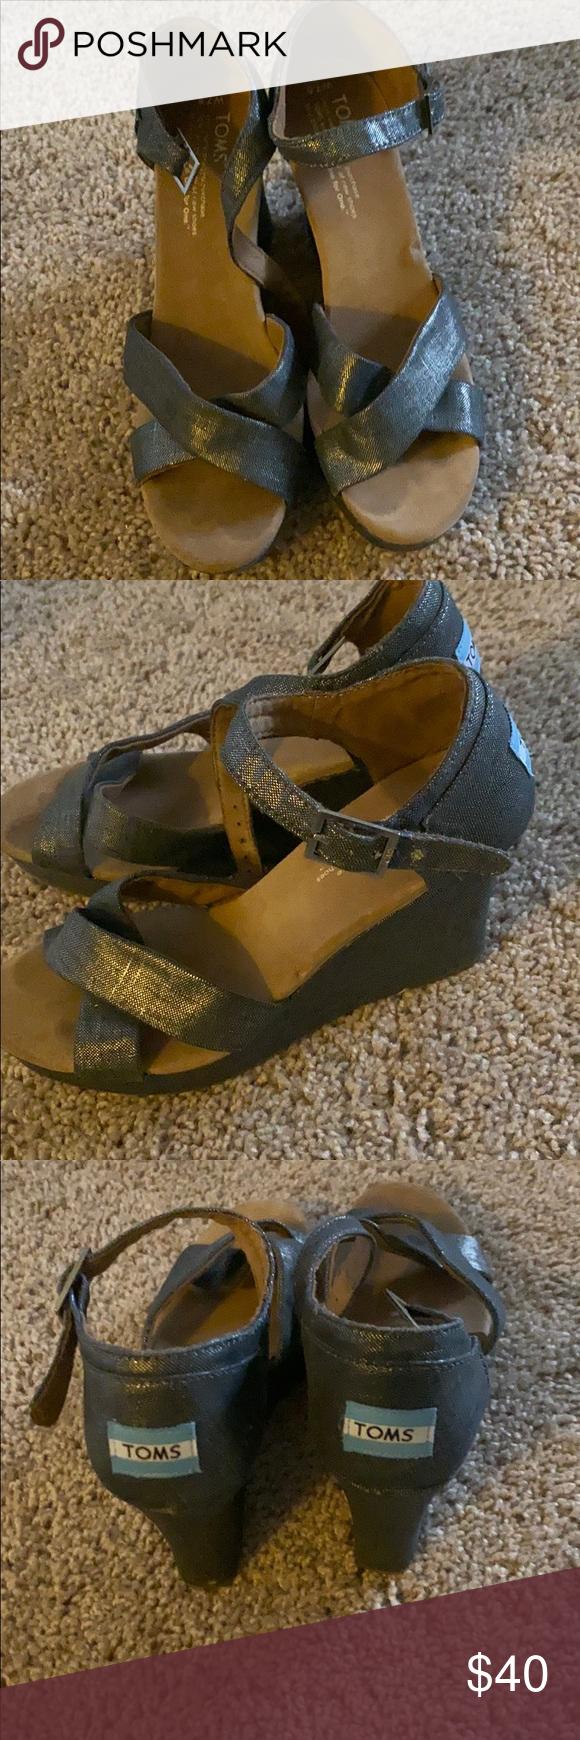 EUC Toms wedge sandals toms wedge sandals, metallic gray, 7..5, Toms Shoes Sandals #tomwedges EUC Toms wedge sandals toms wedge sandals, metallic gray, 7..5, Toms Shoes Sandals #tomwedges